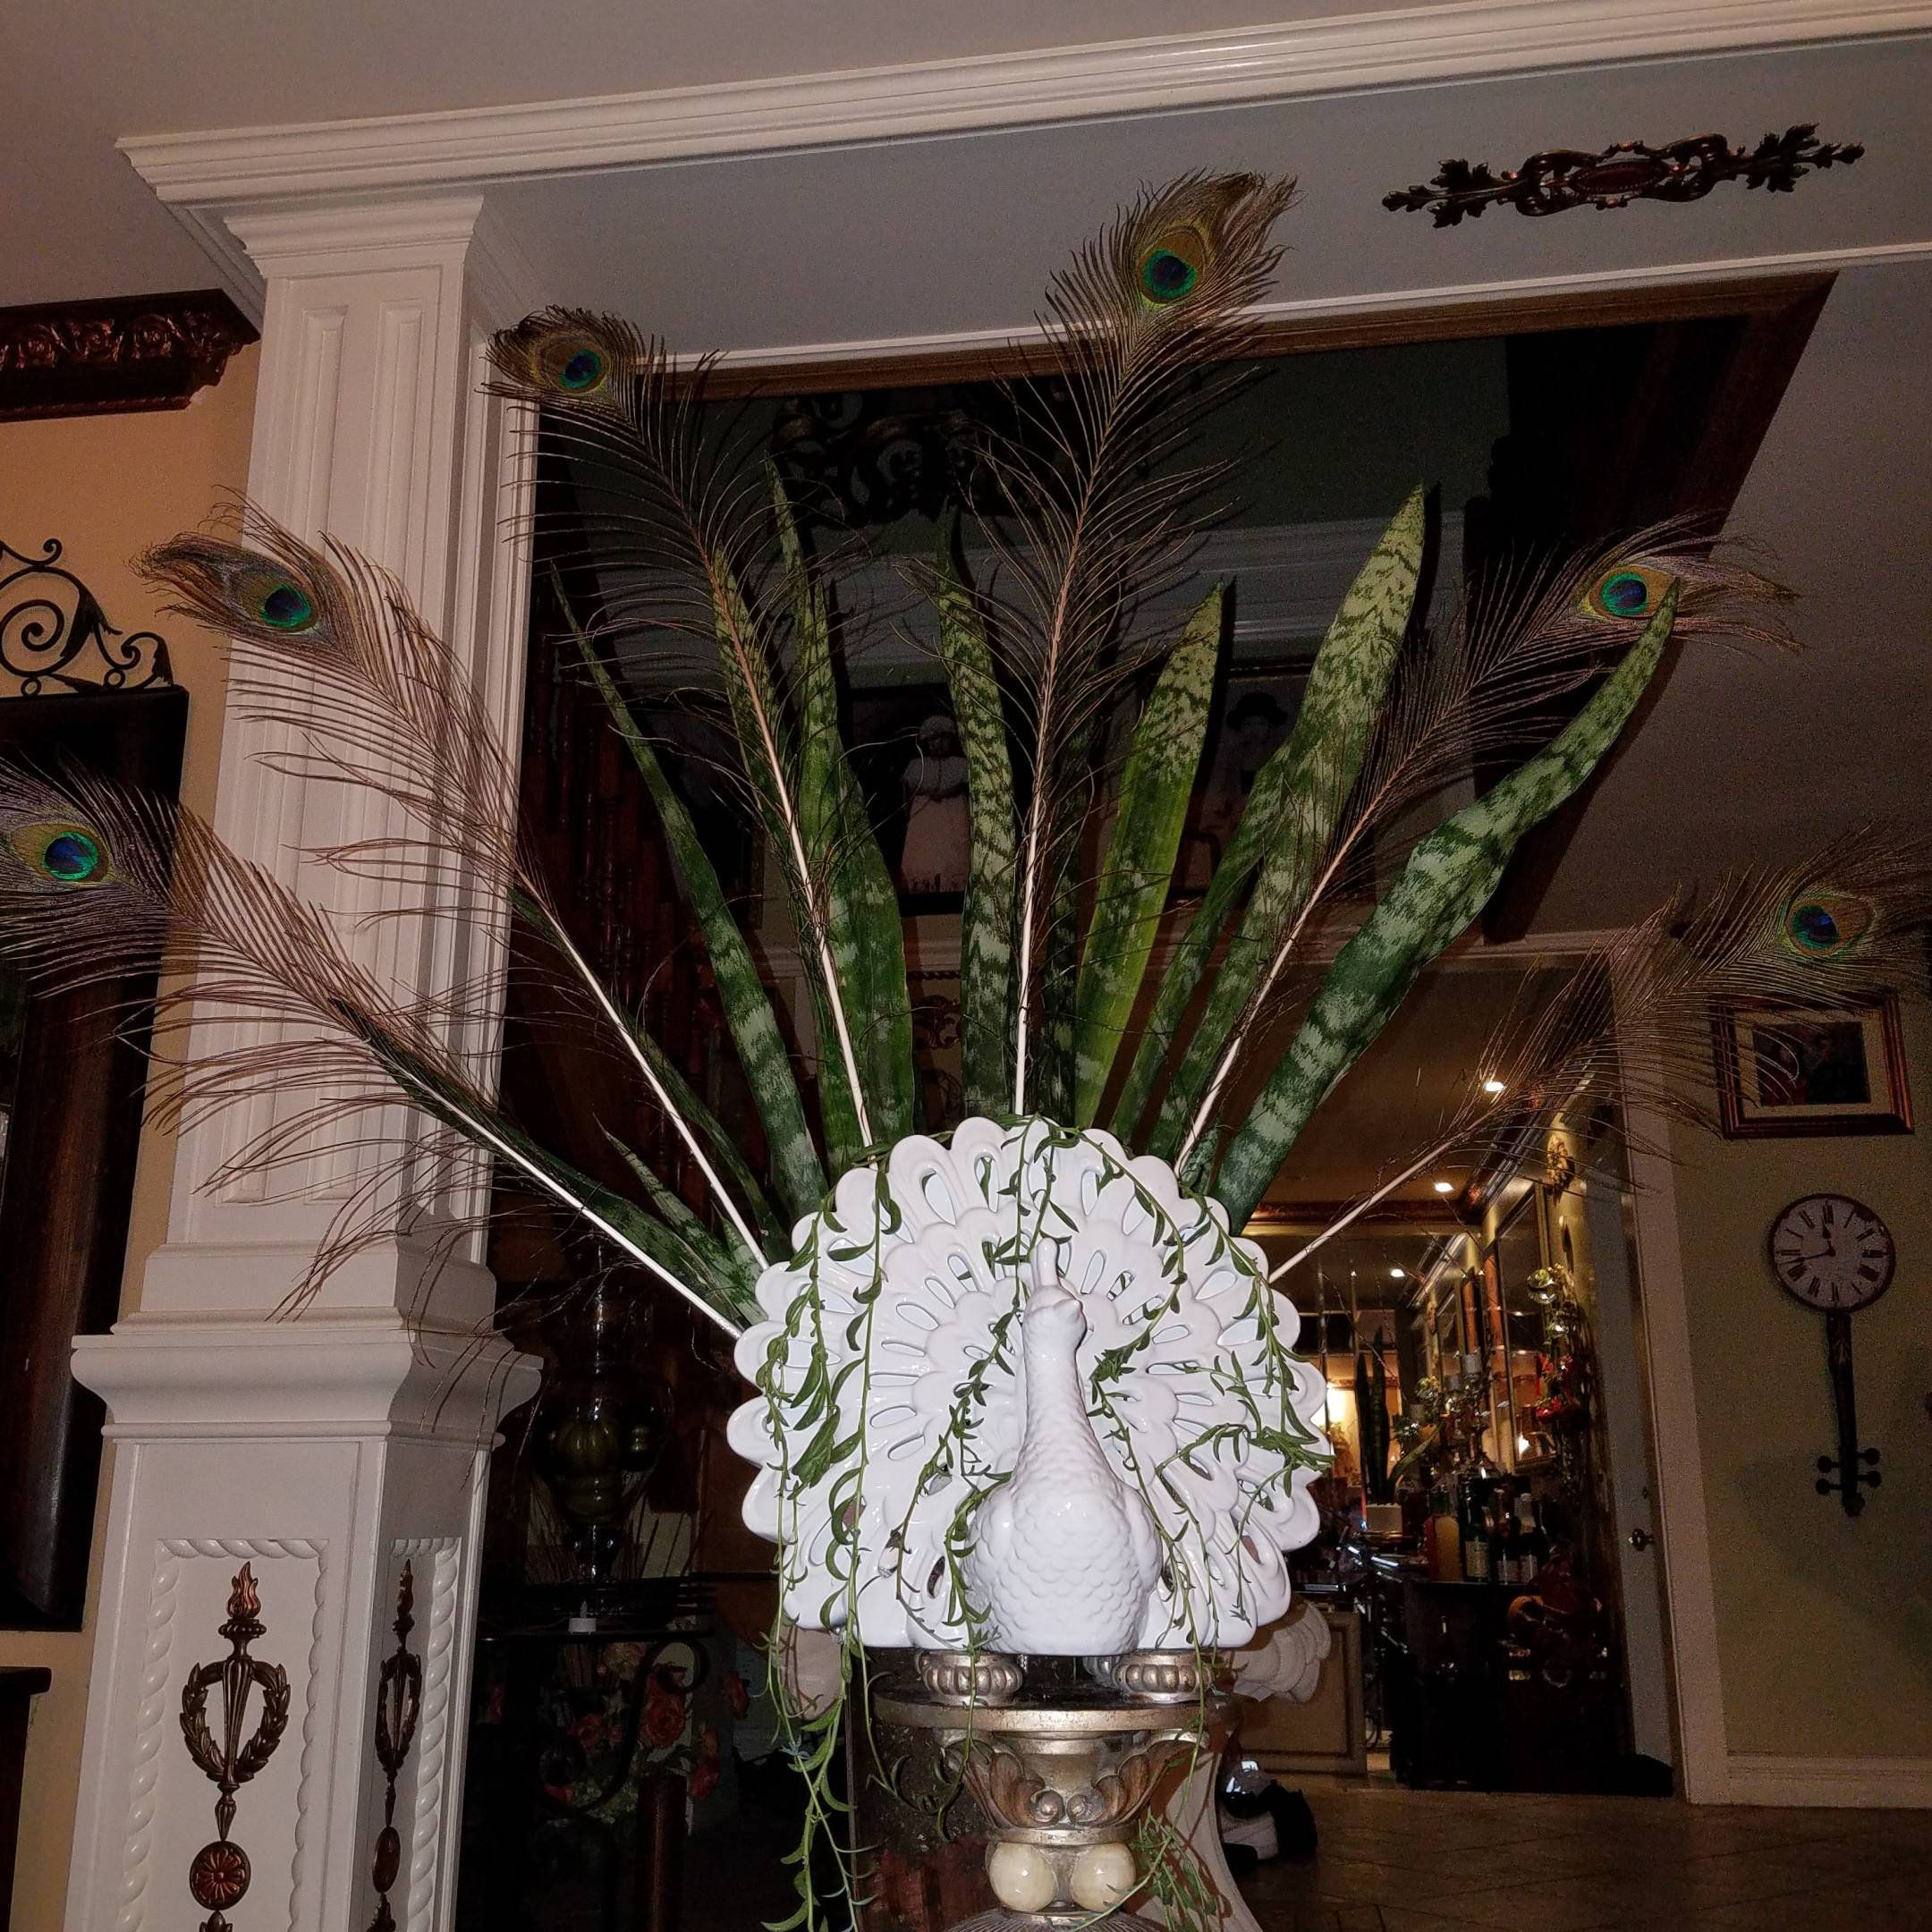 Home decor, novelty planter, White Peacock, plant air